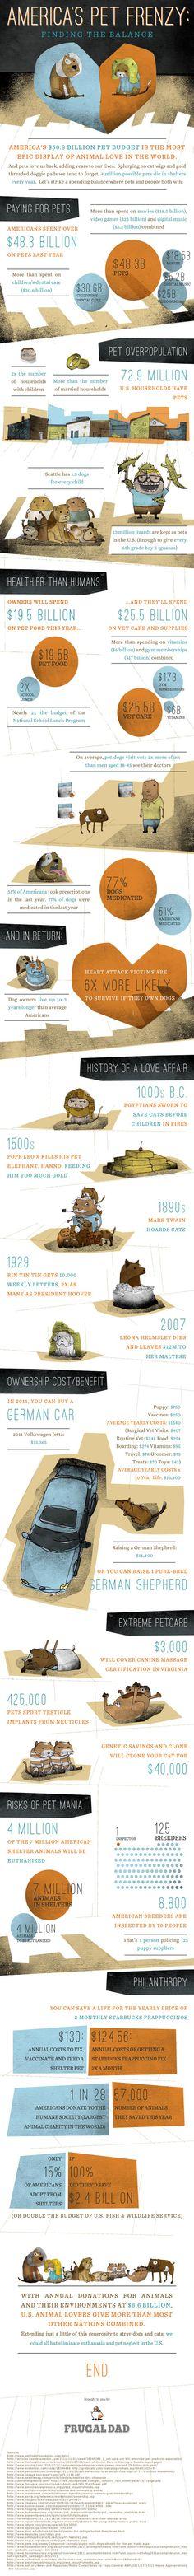 Interesting pet statistics